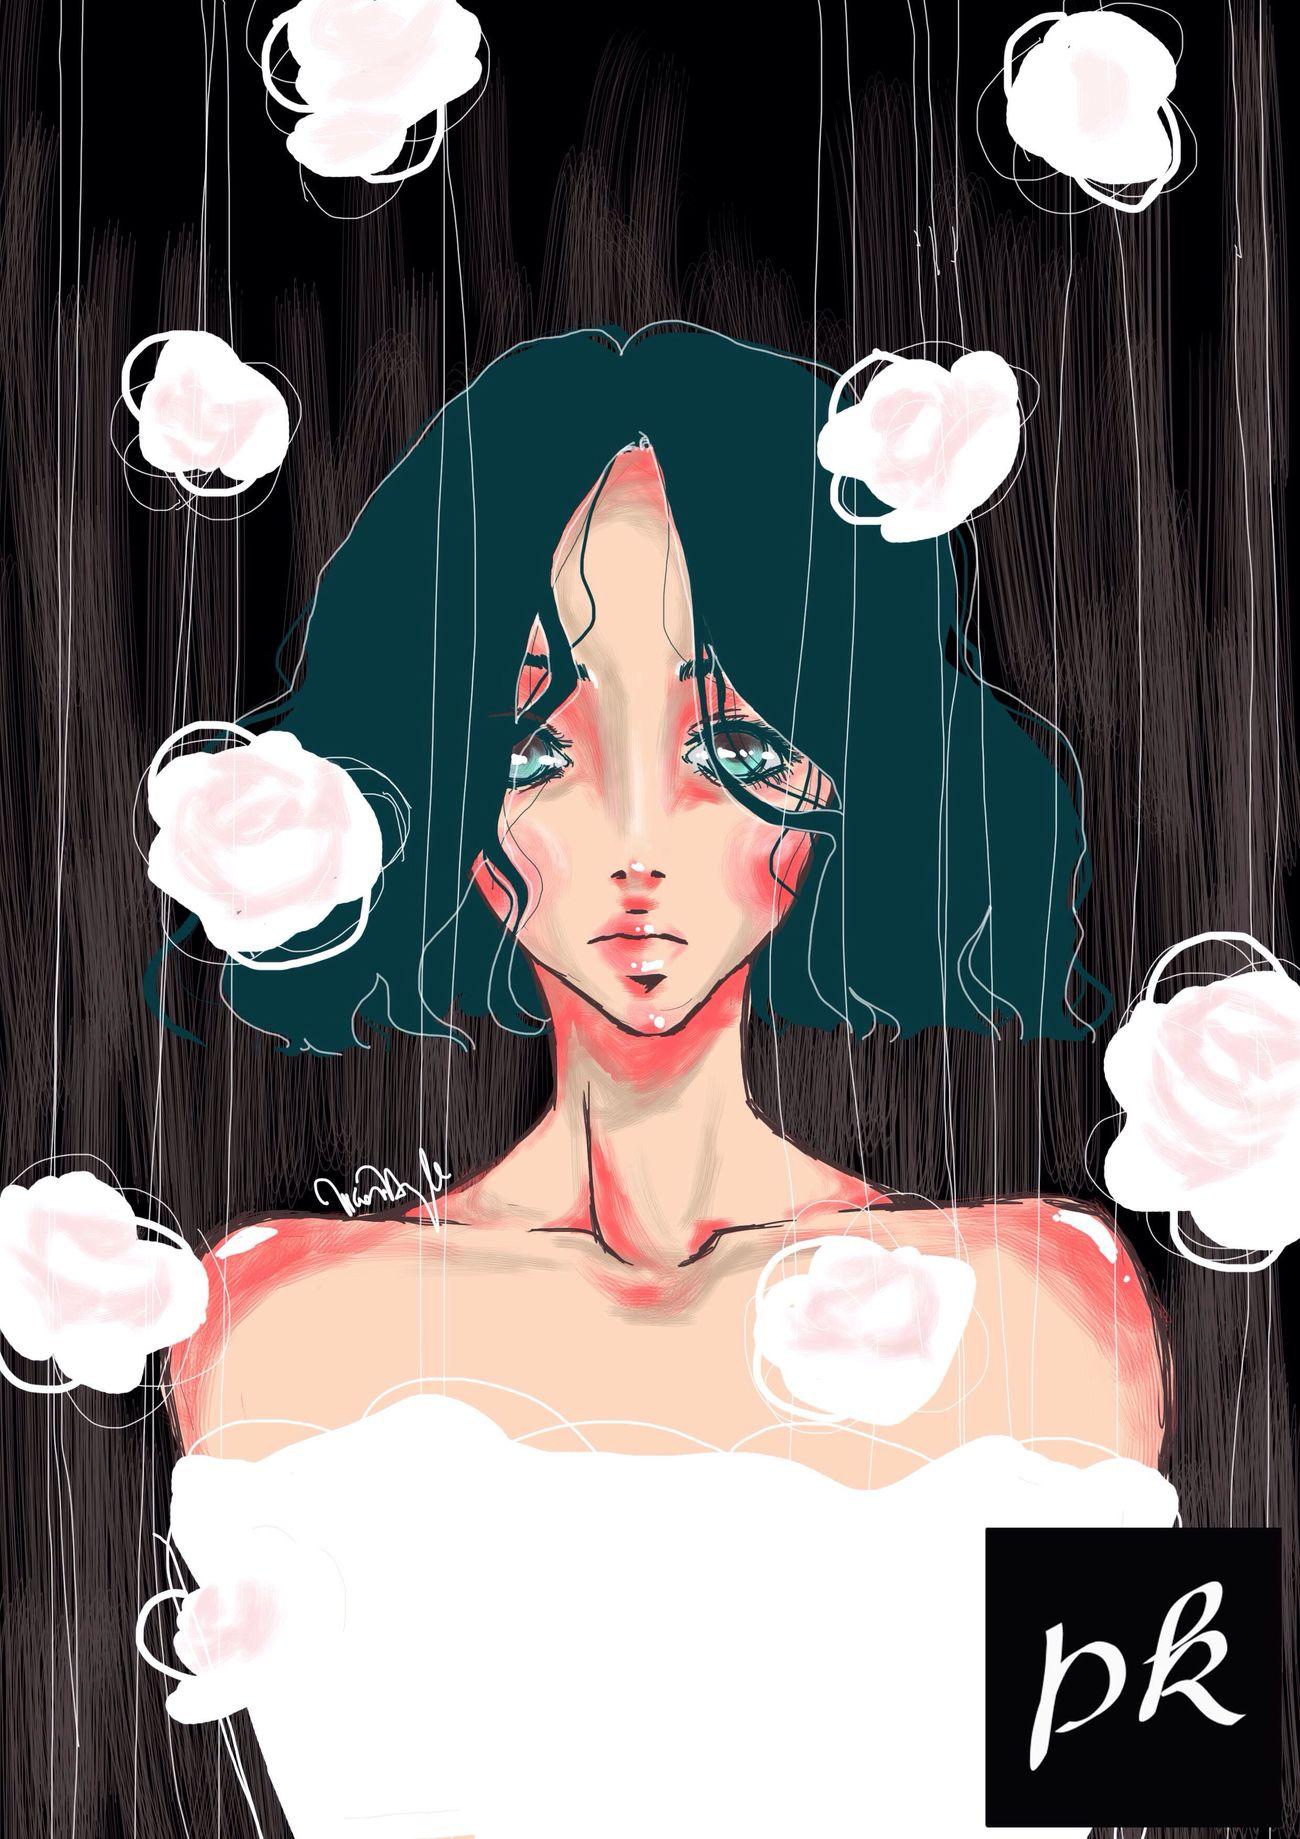 Art My Art Photoshop Manga Girl Roses Flower Art, Drawing, Creativity